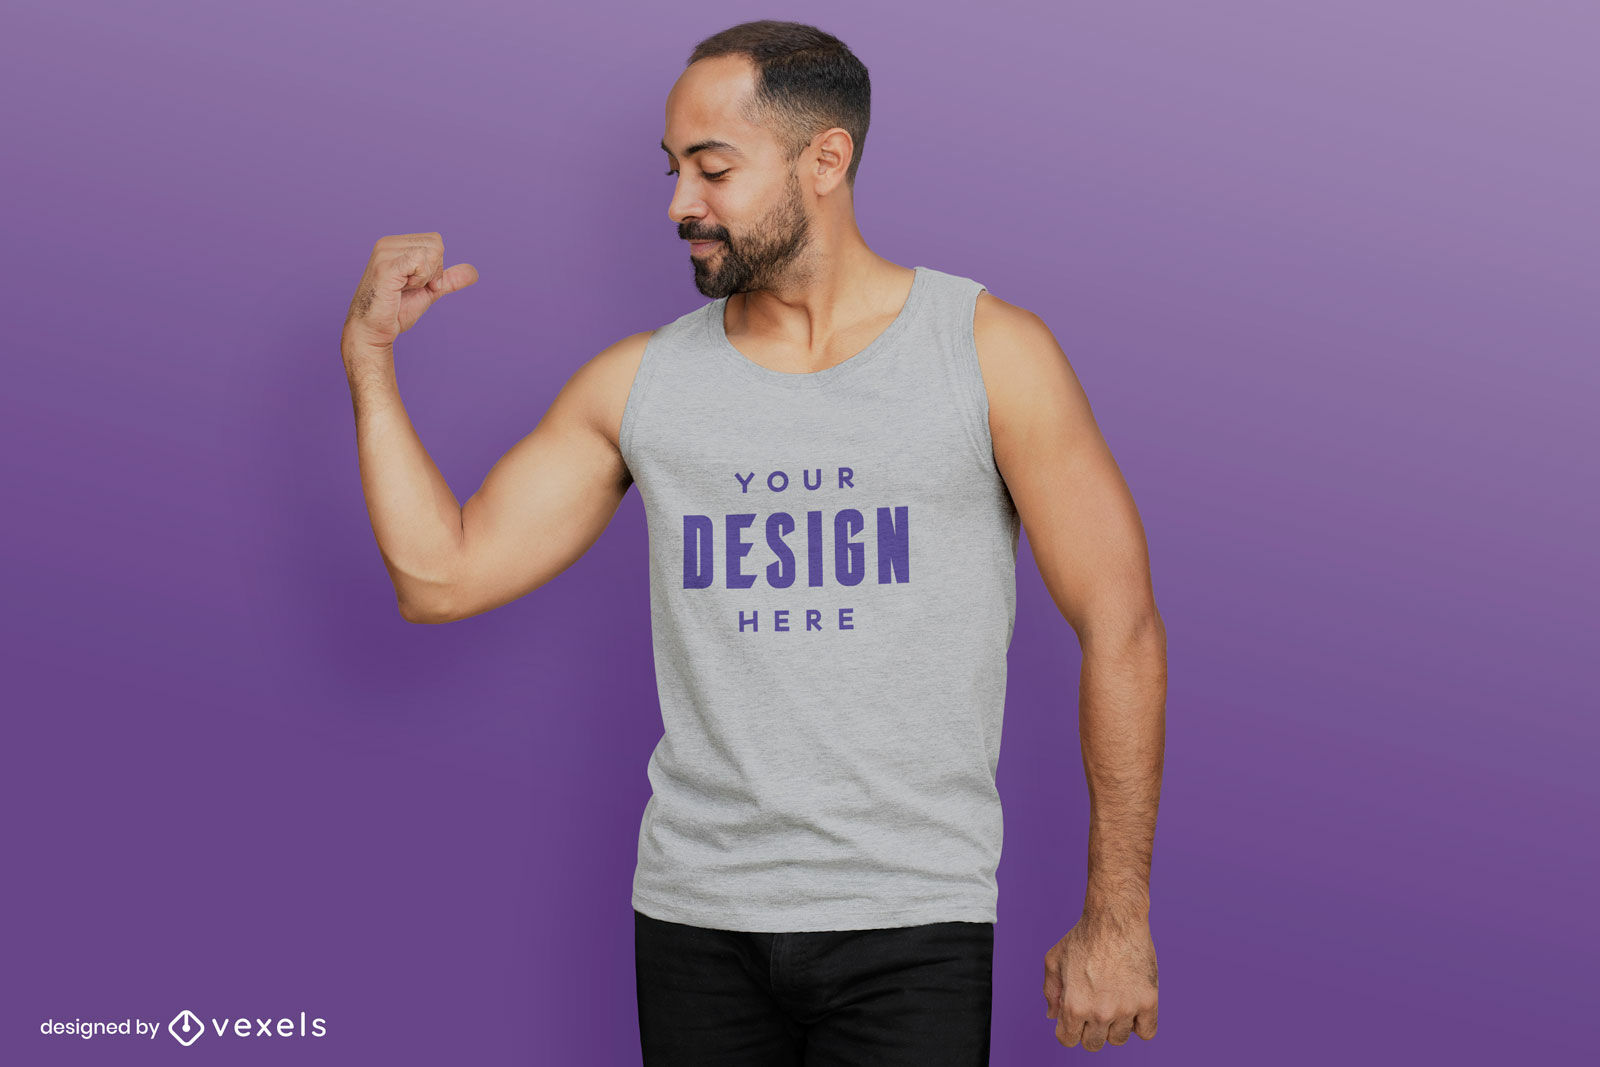 Camiseta sin mangas gris hombre maqueta fondo morado